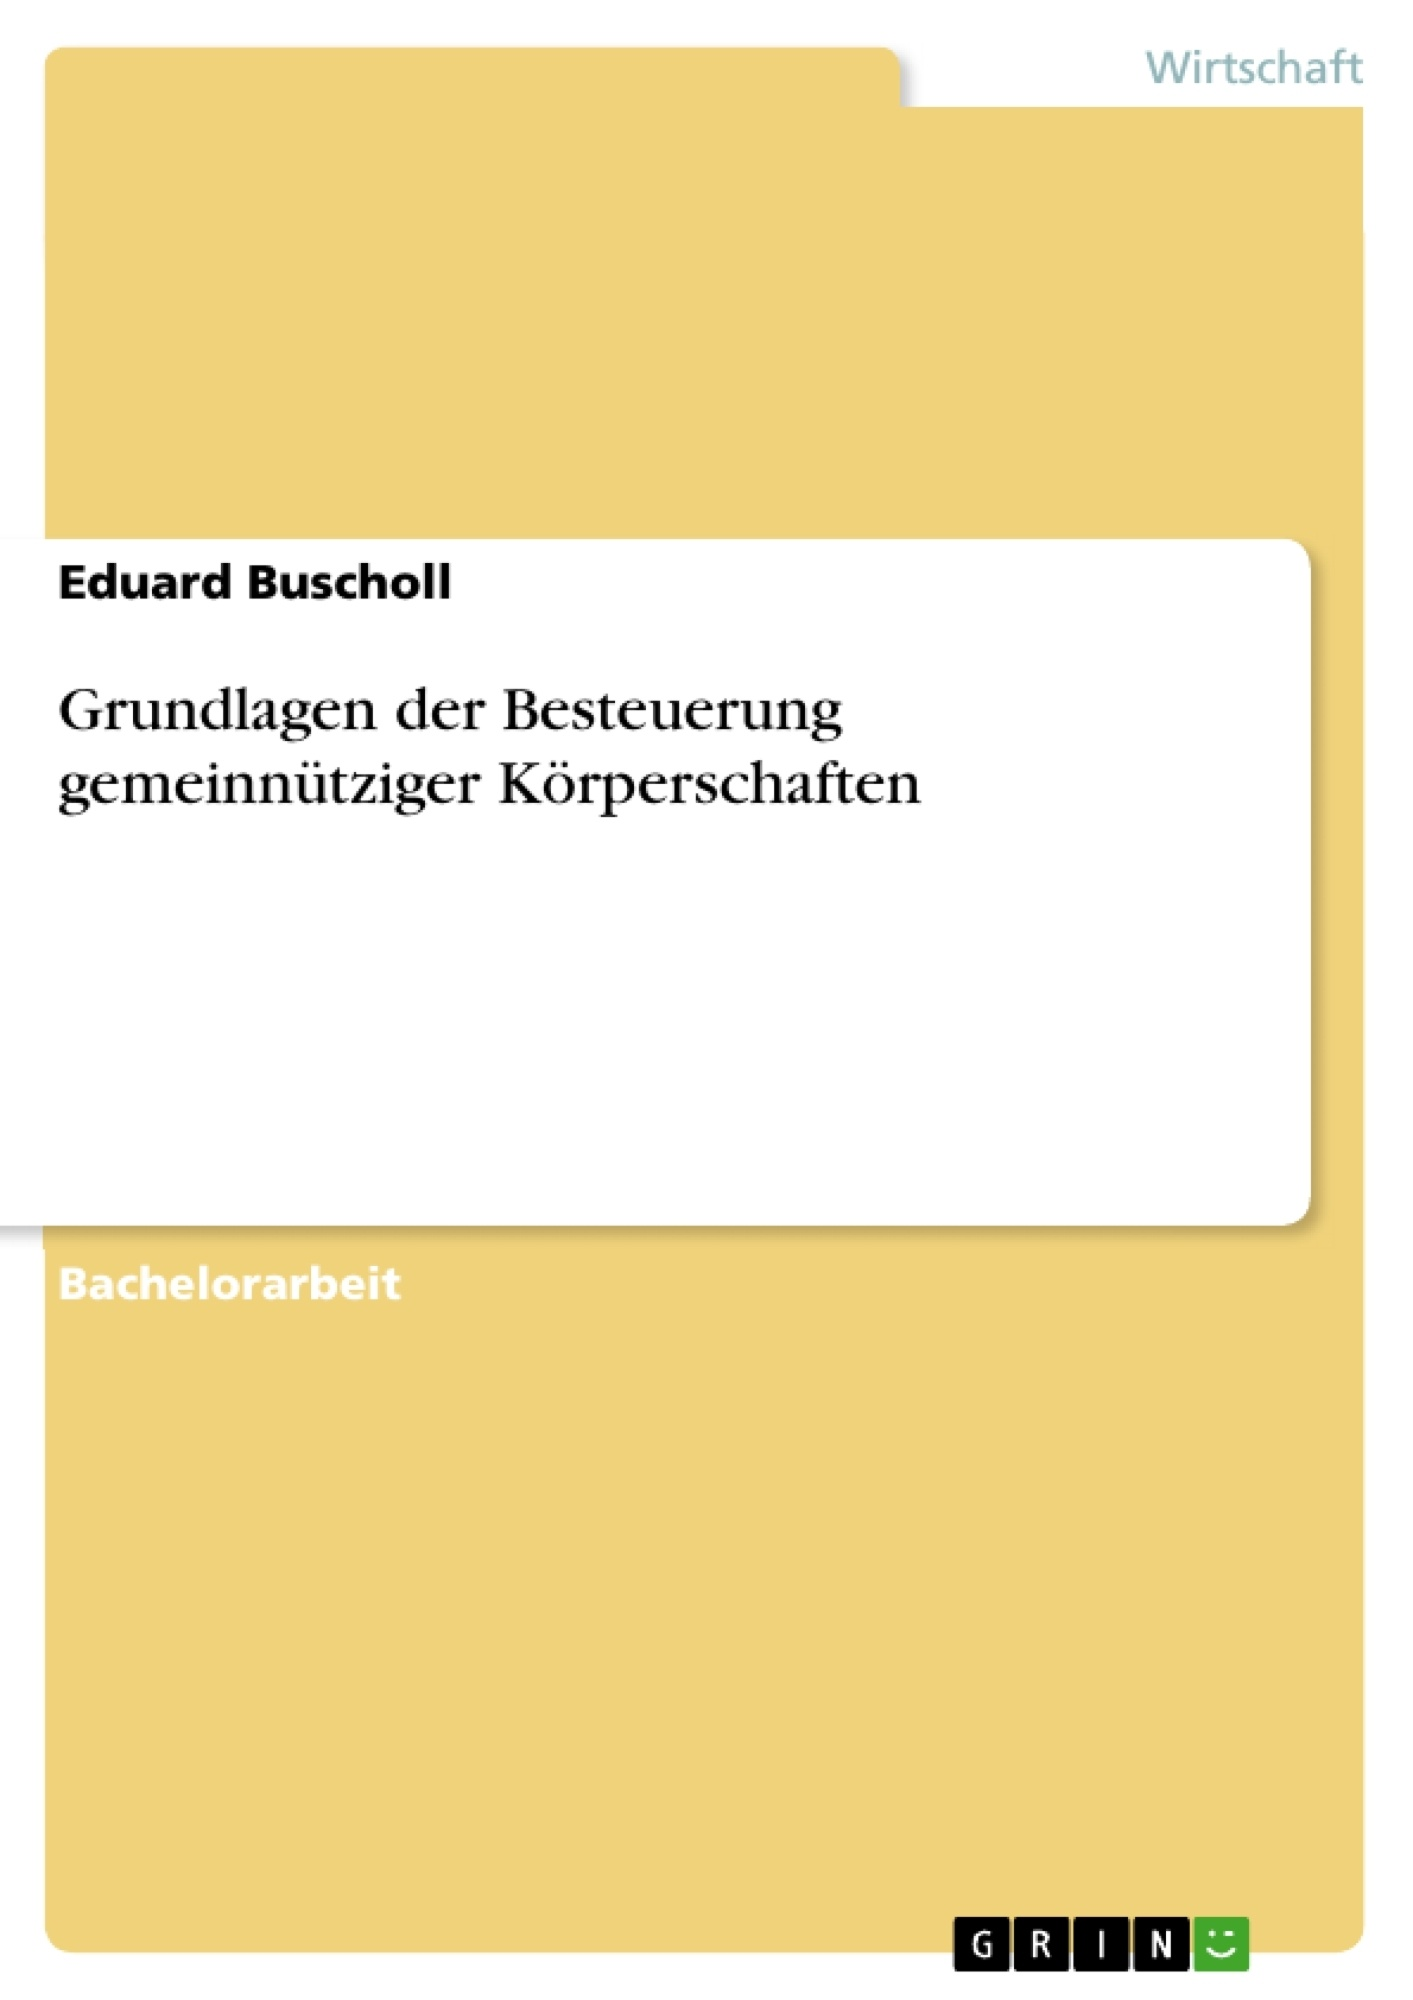 Titel: Grundlagen der Besteuerung gemeinnütziger Körperschaften